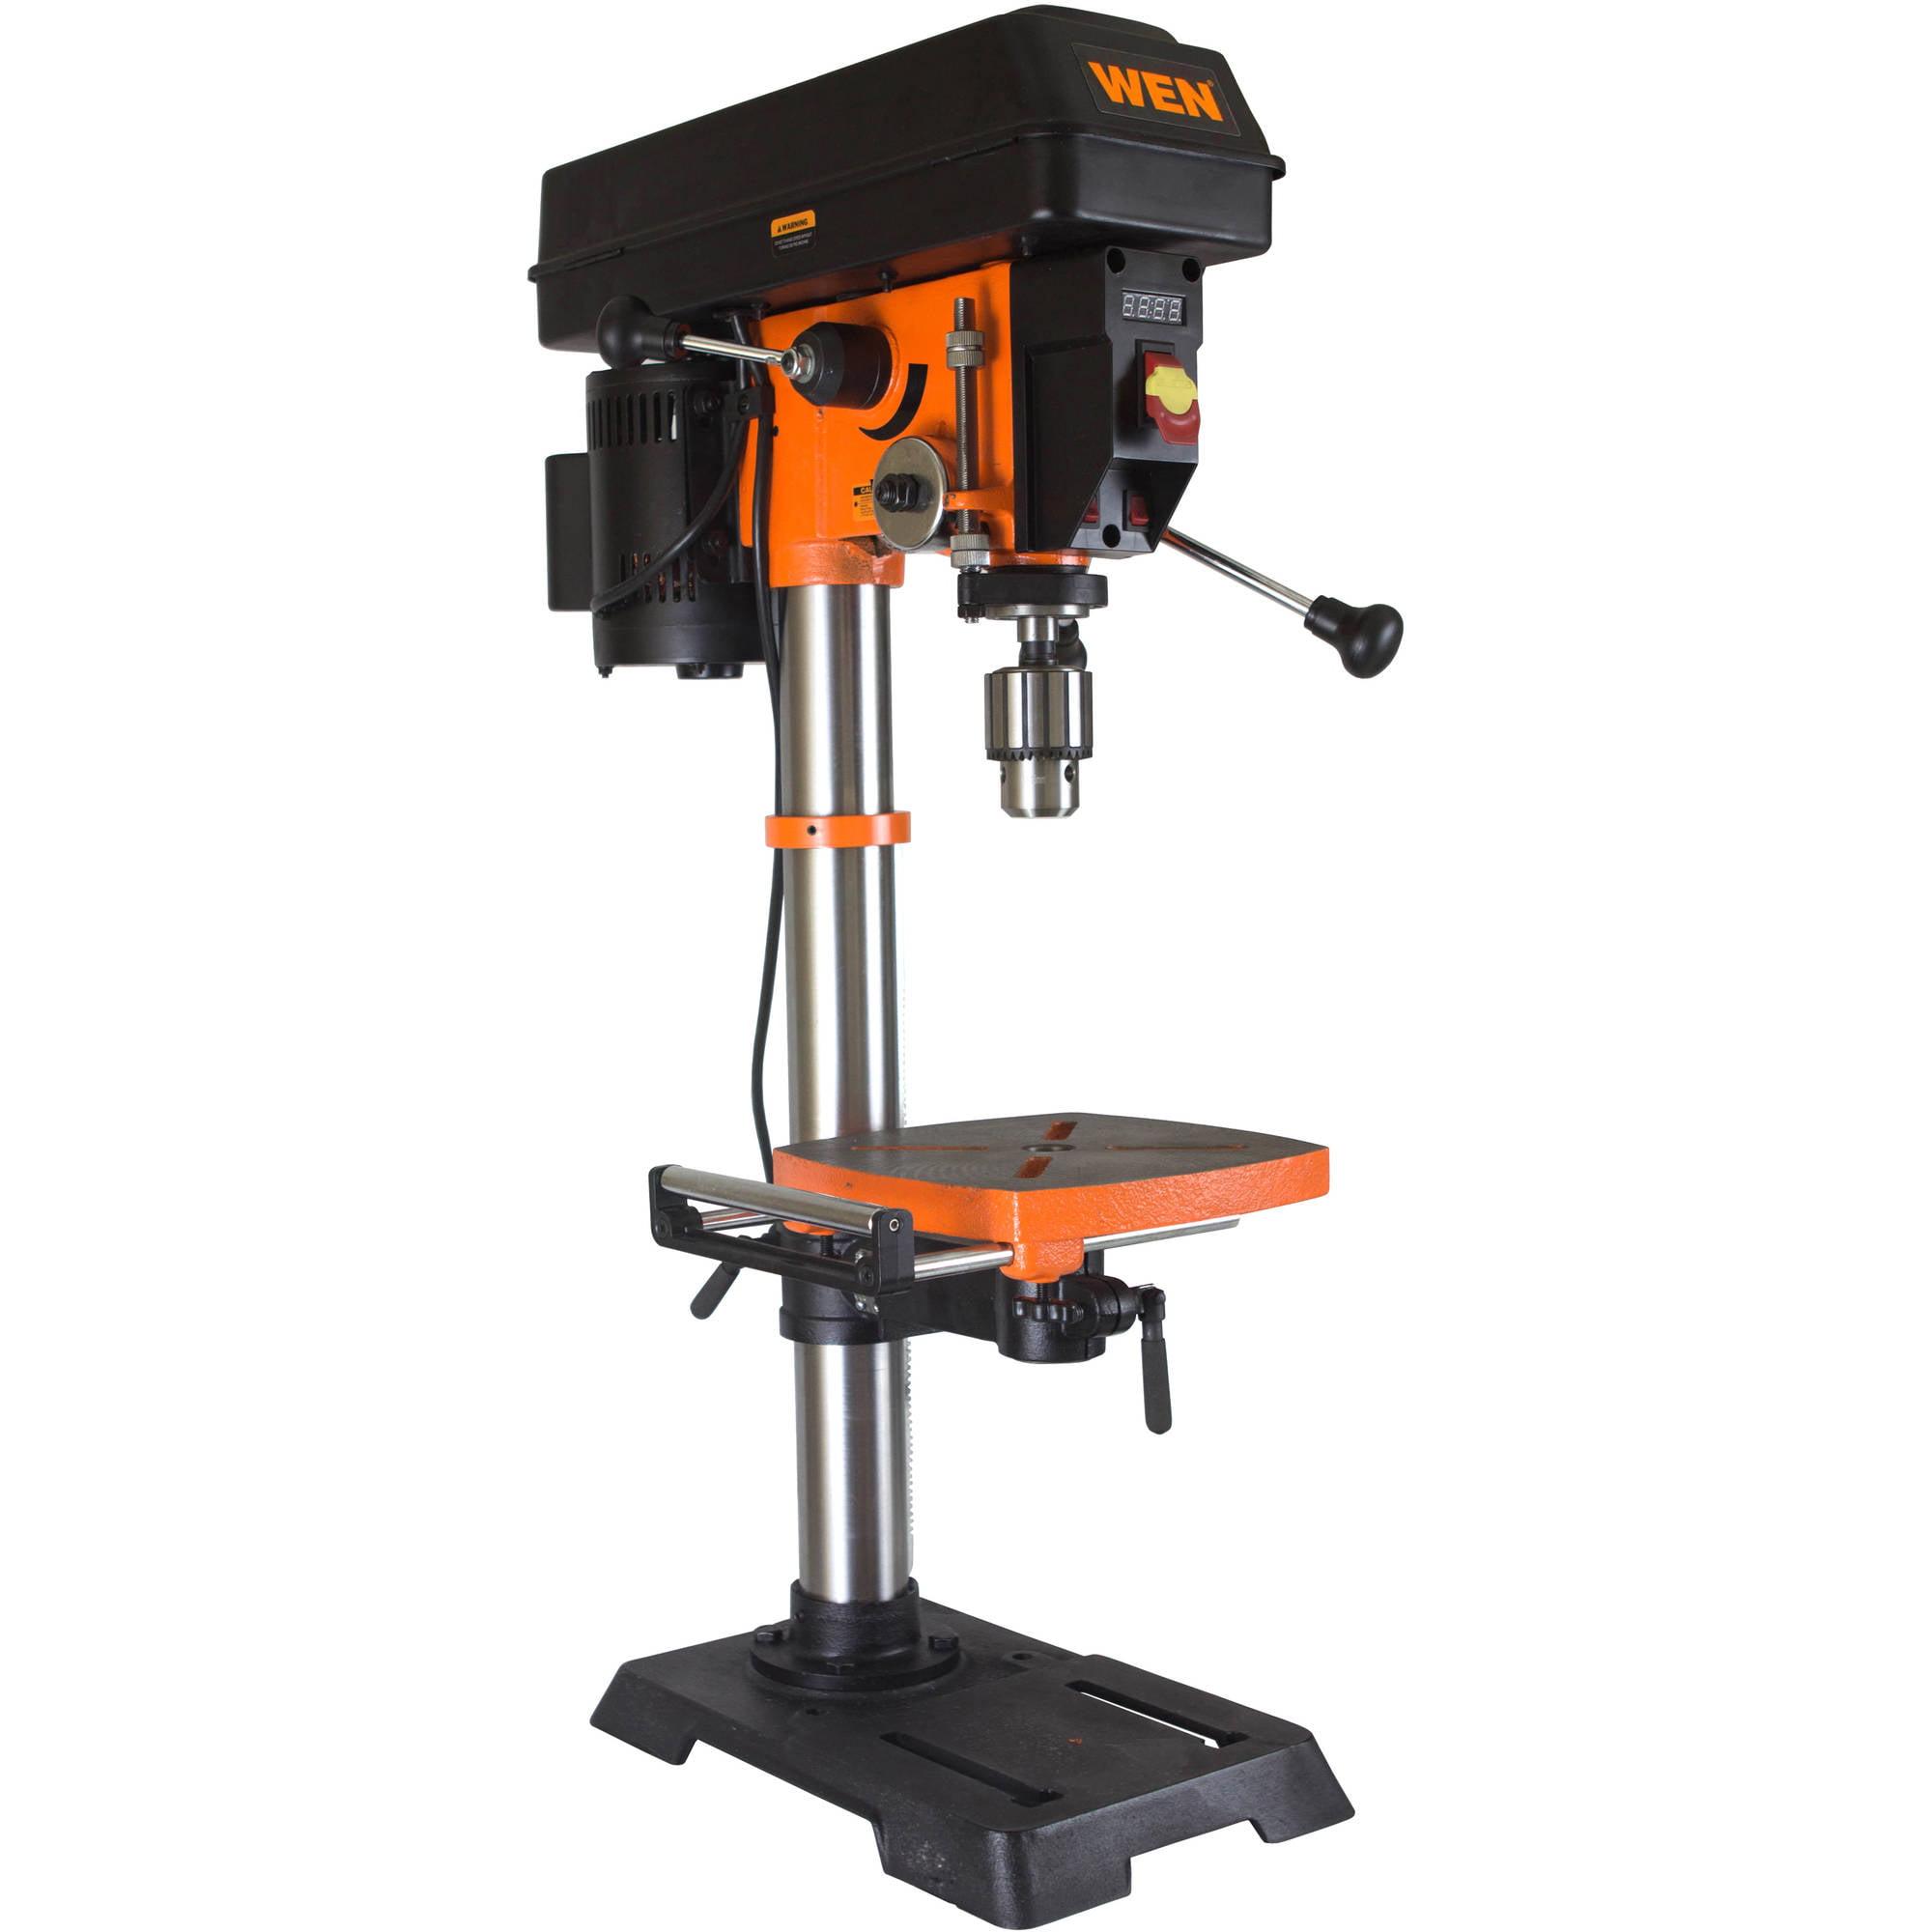 "WEN 12"" Variable Speed Drill Press"